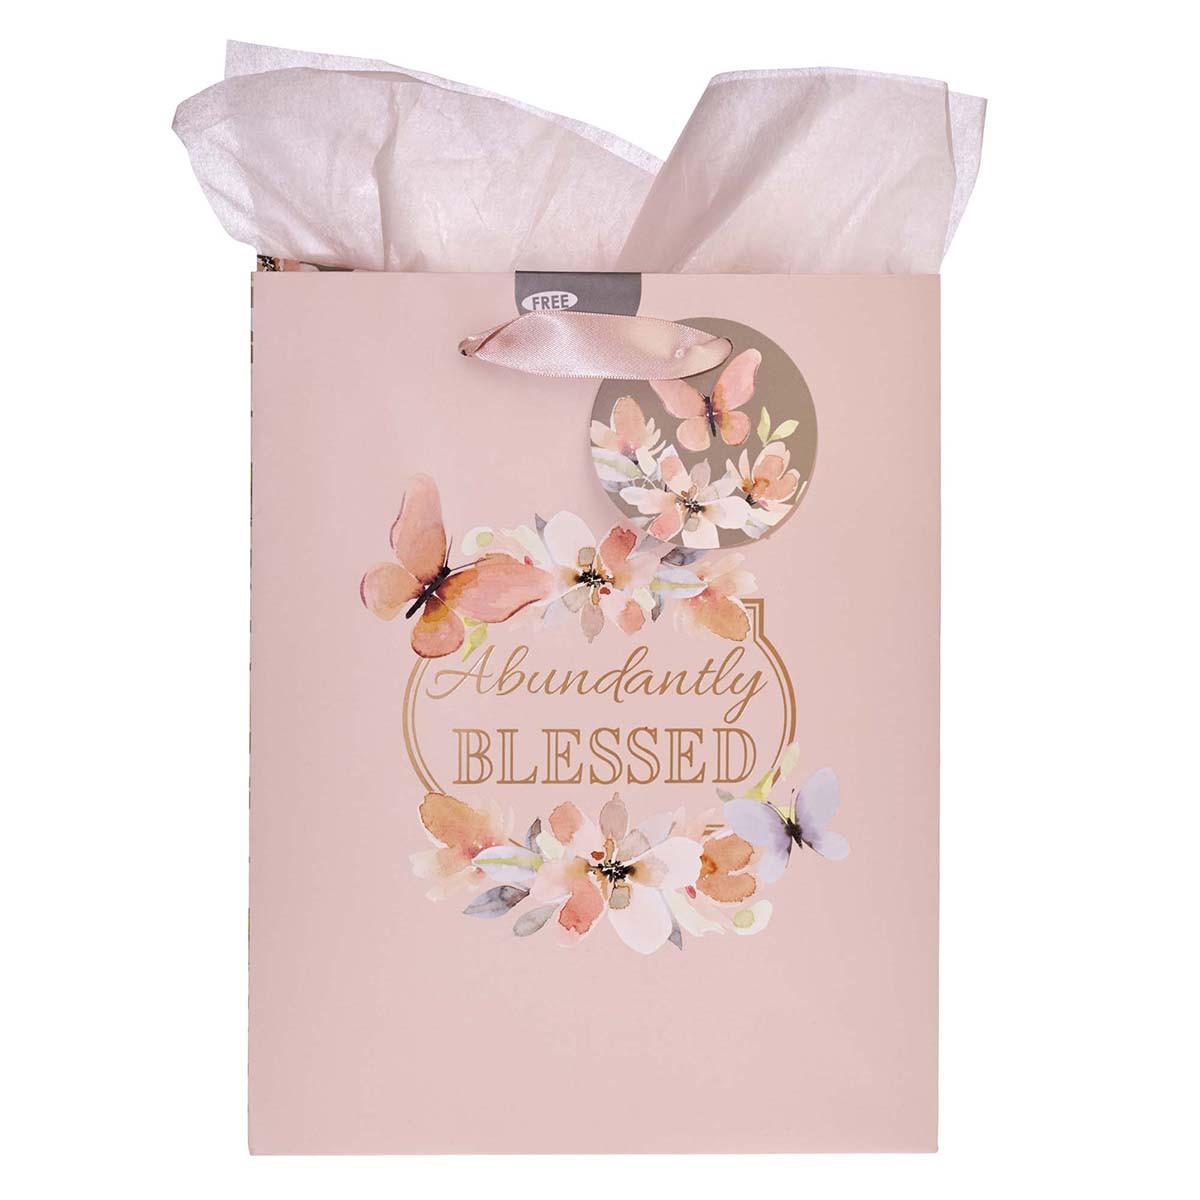 Abundantly Blessed (Medium Gift Bag)